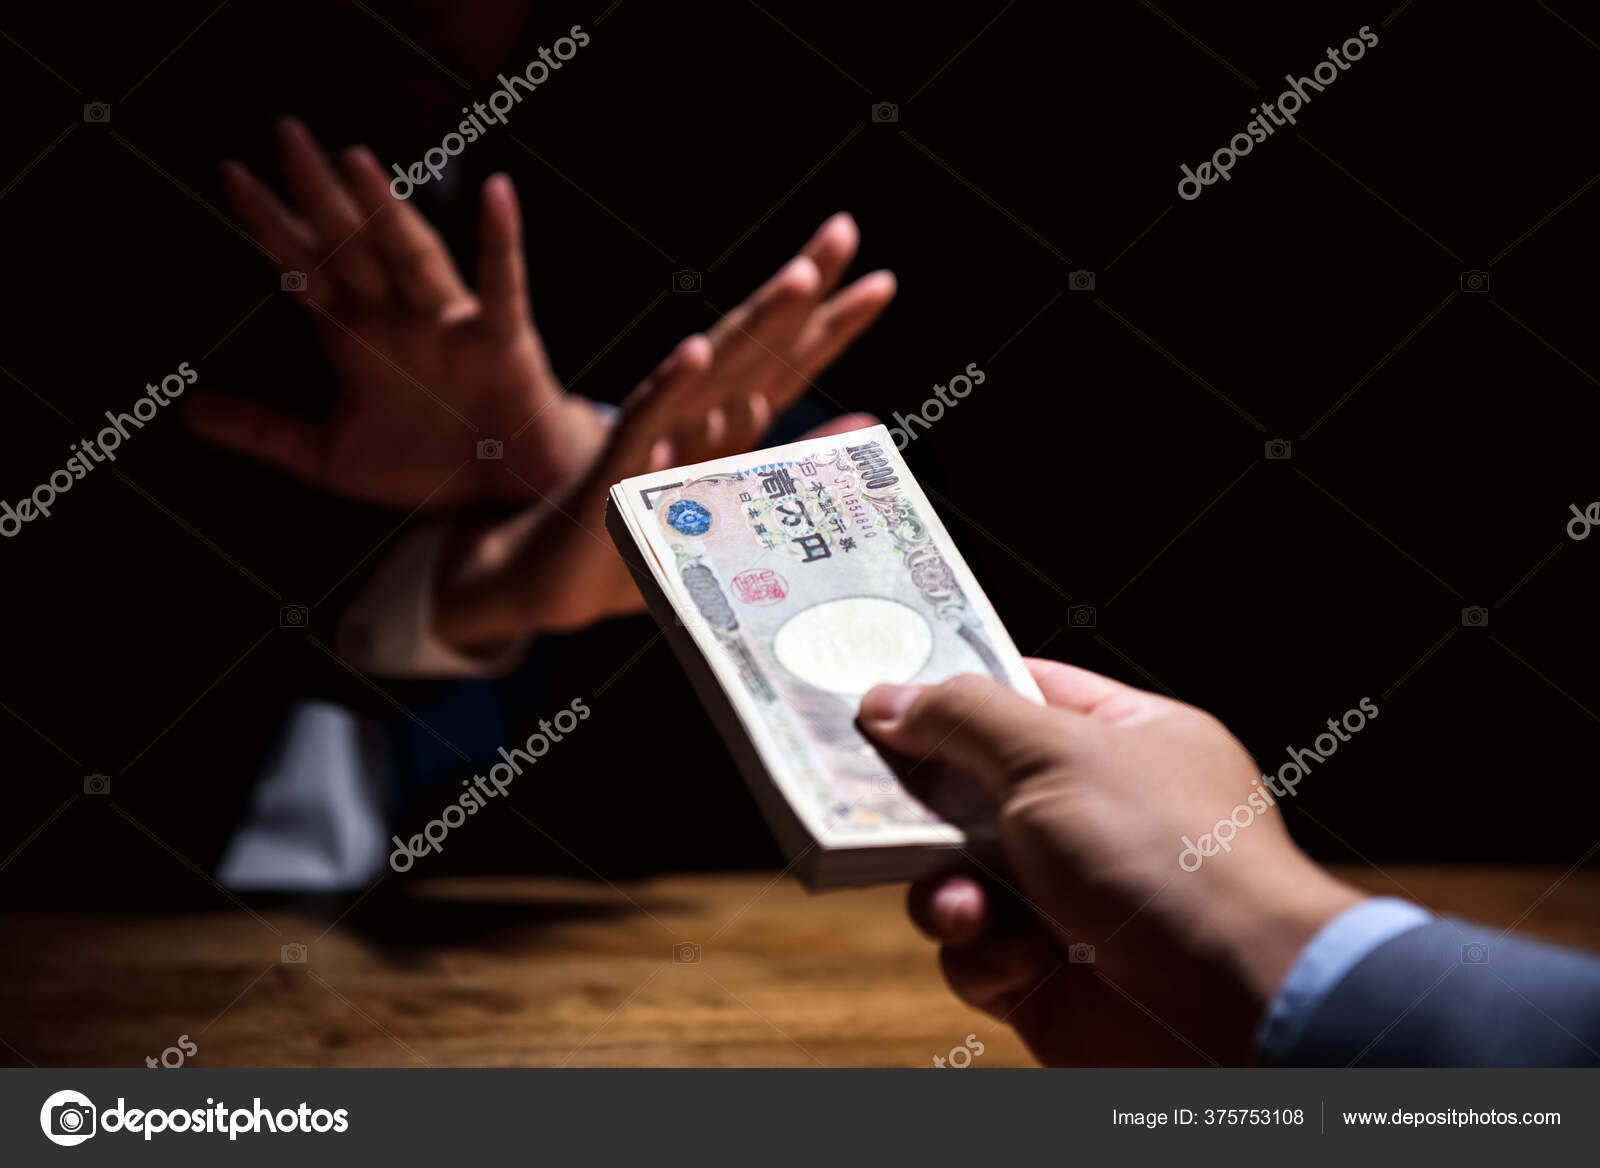 depositphotos_375753108-stock-photo-businessman-refusing-money-japanese-yen.jpg